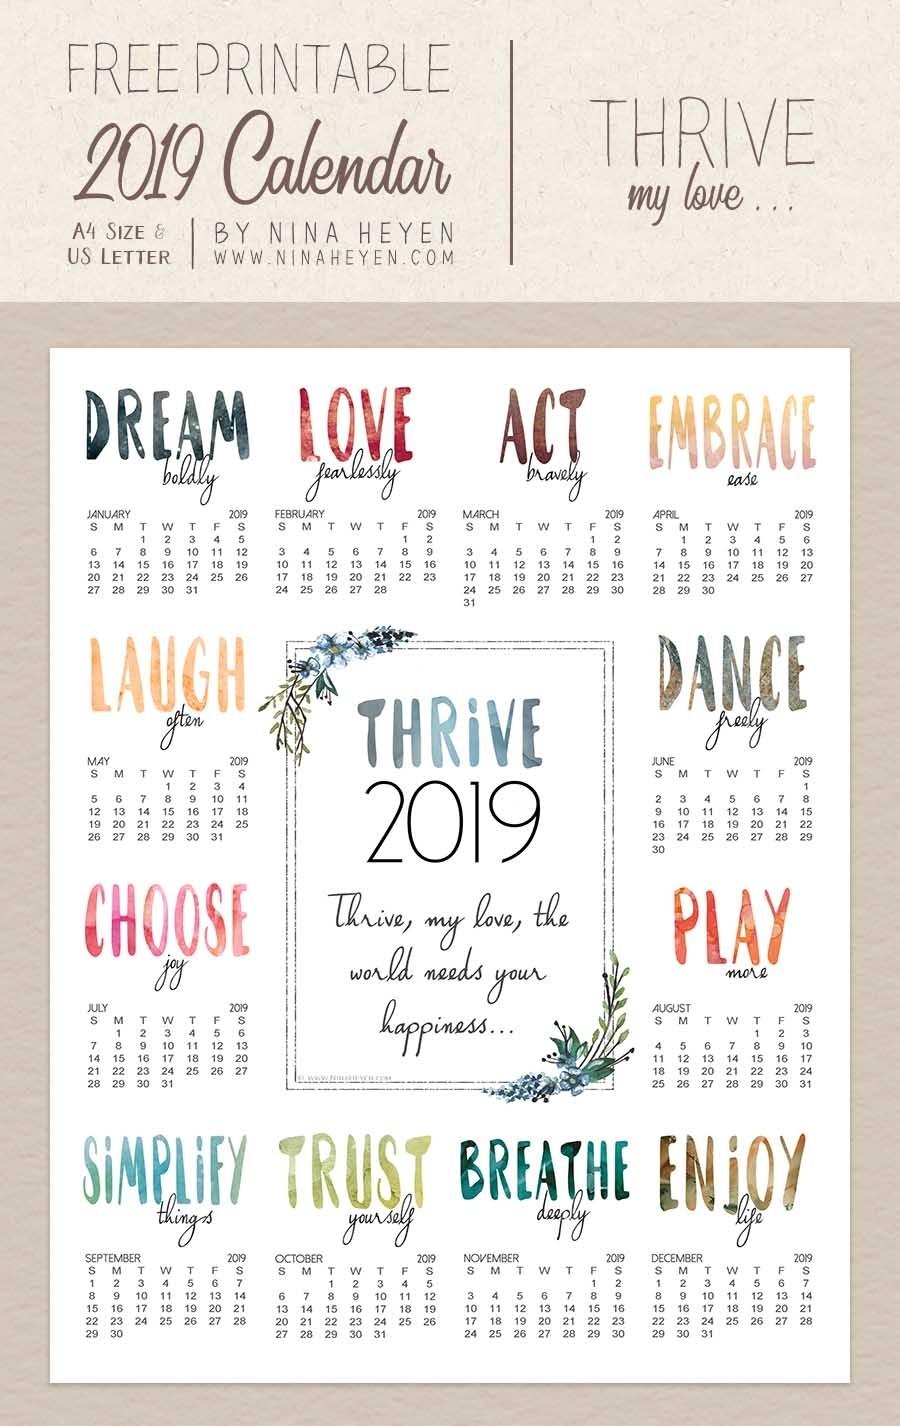 Thrive | Free Printable Wall Calendar 2019 | Nina Heyen